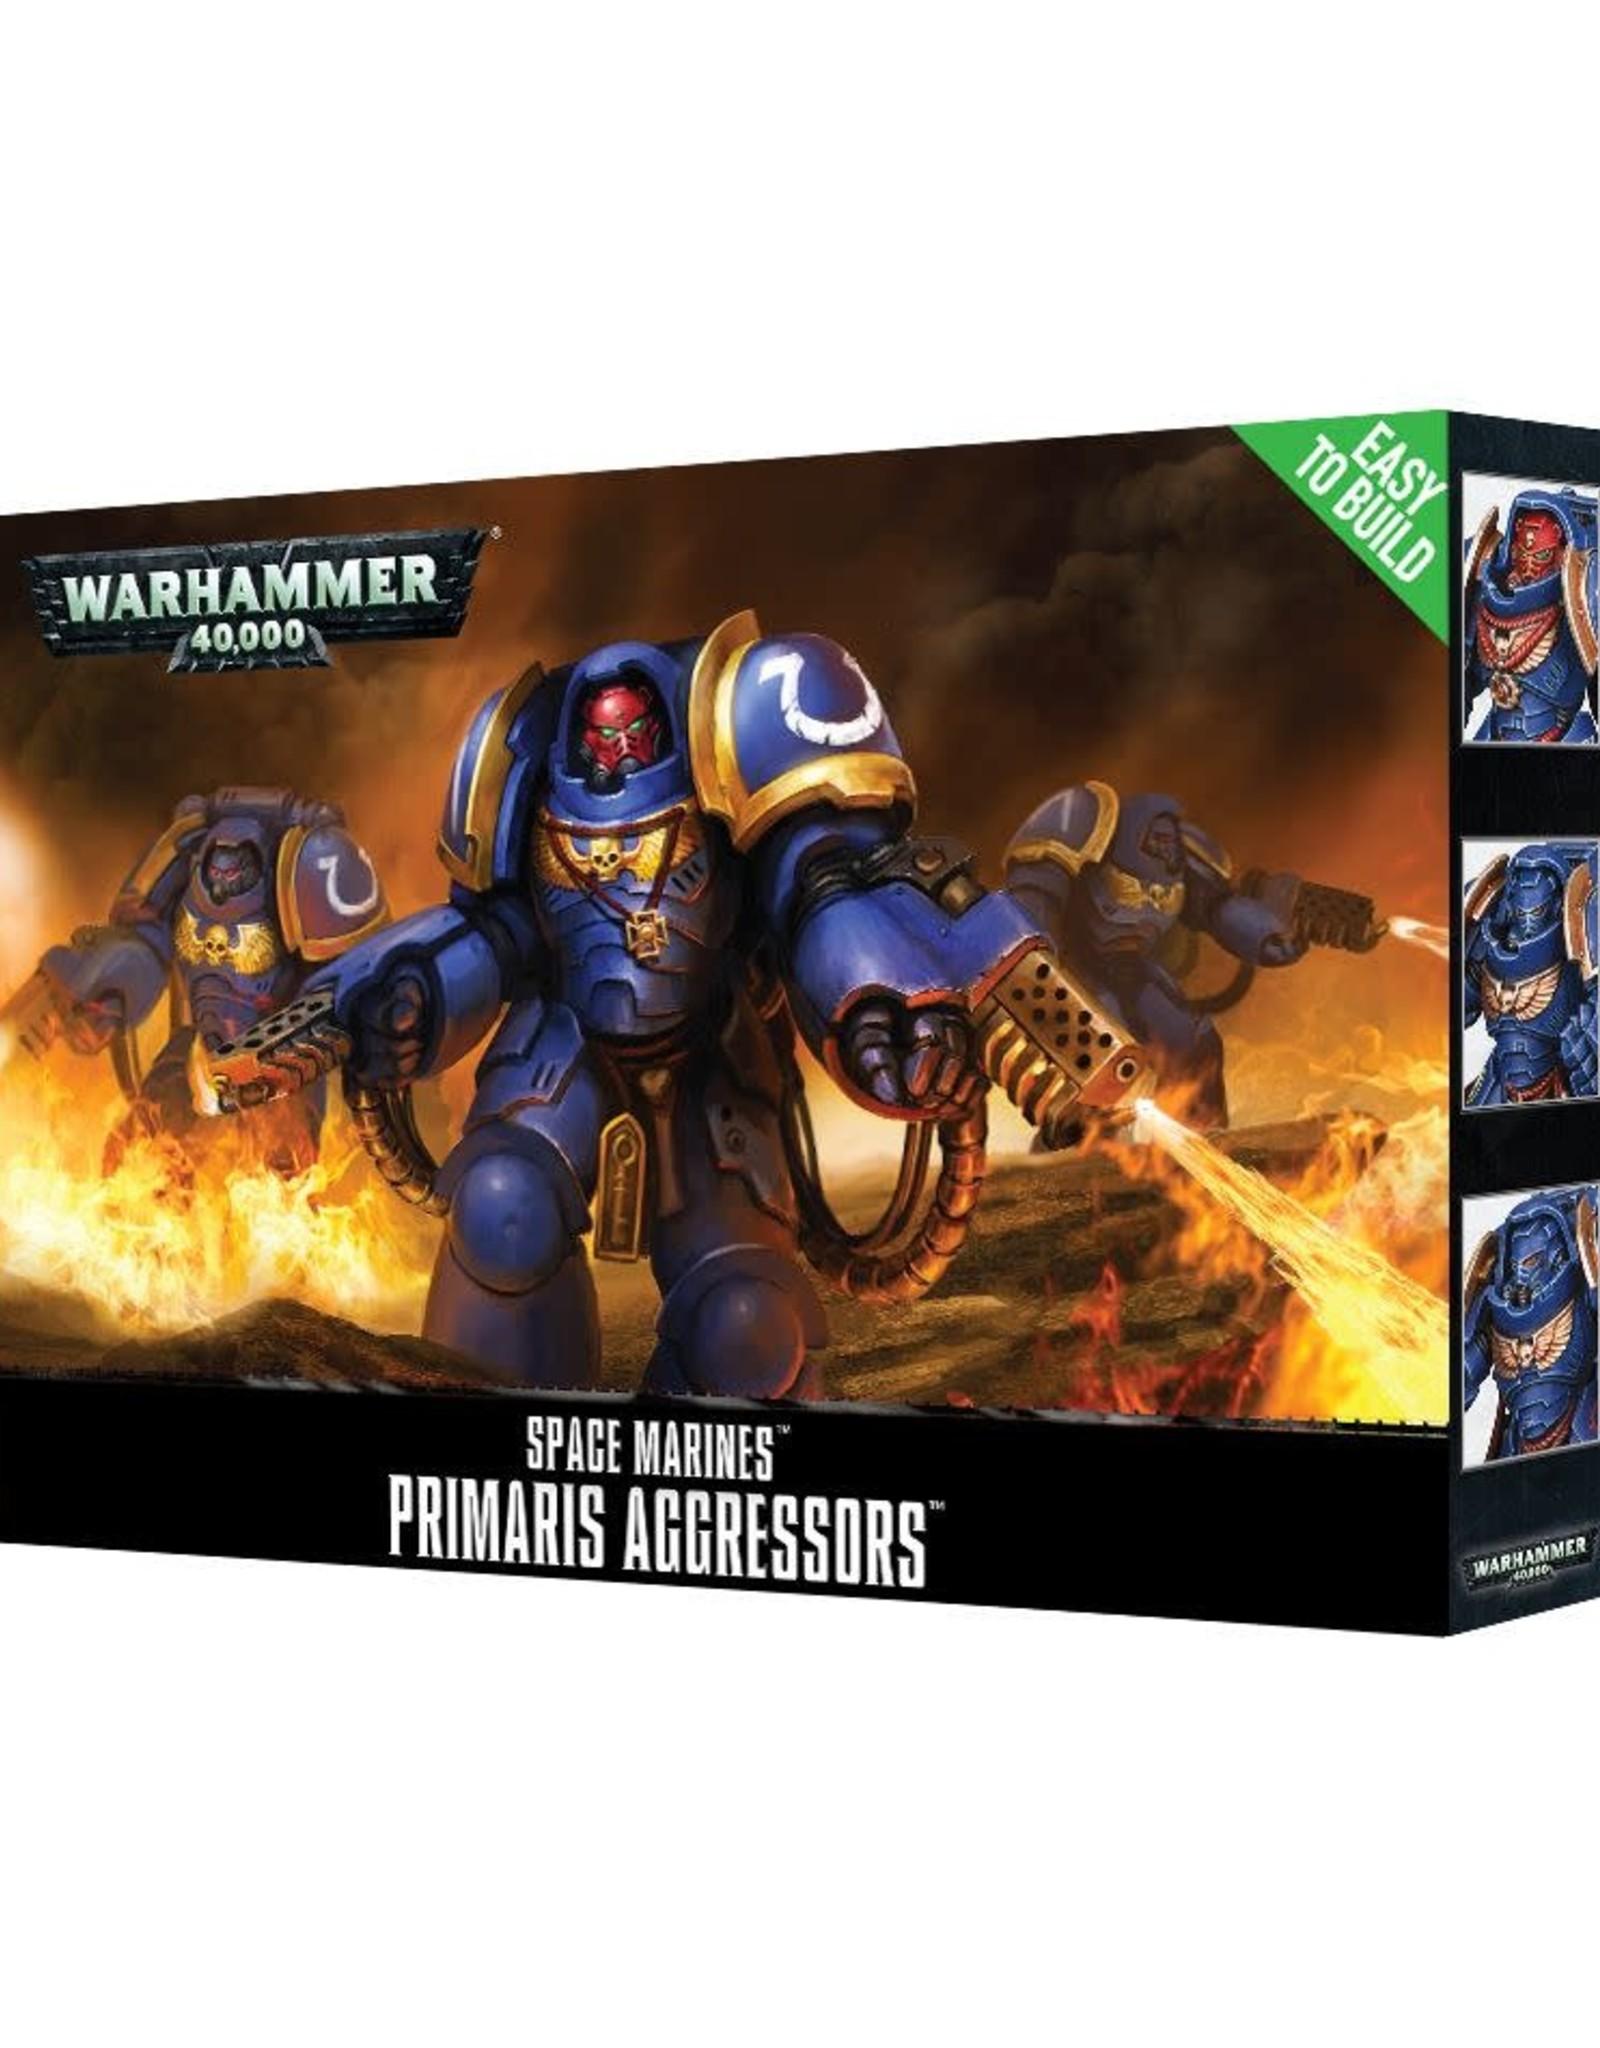 Warhammer 40K ETB: Space Marines Primaris Aggressor